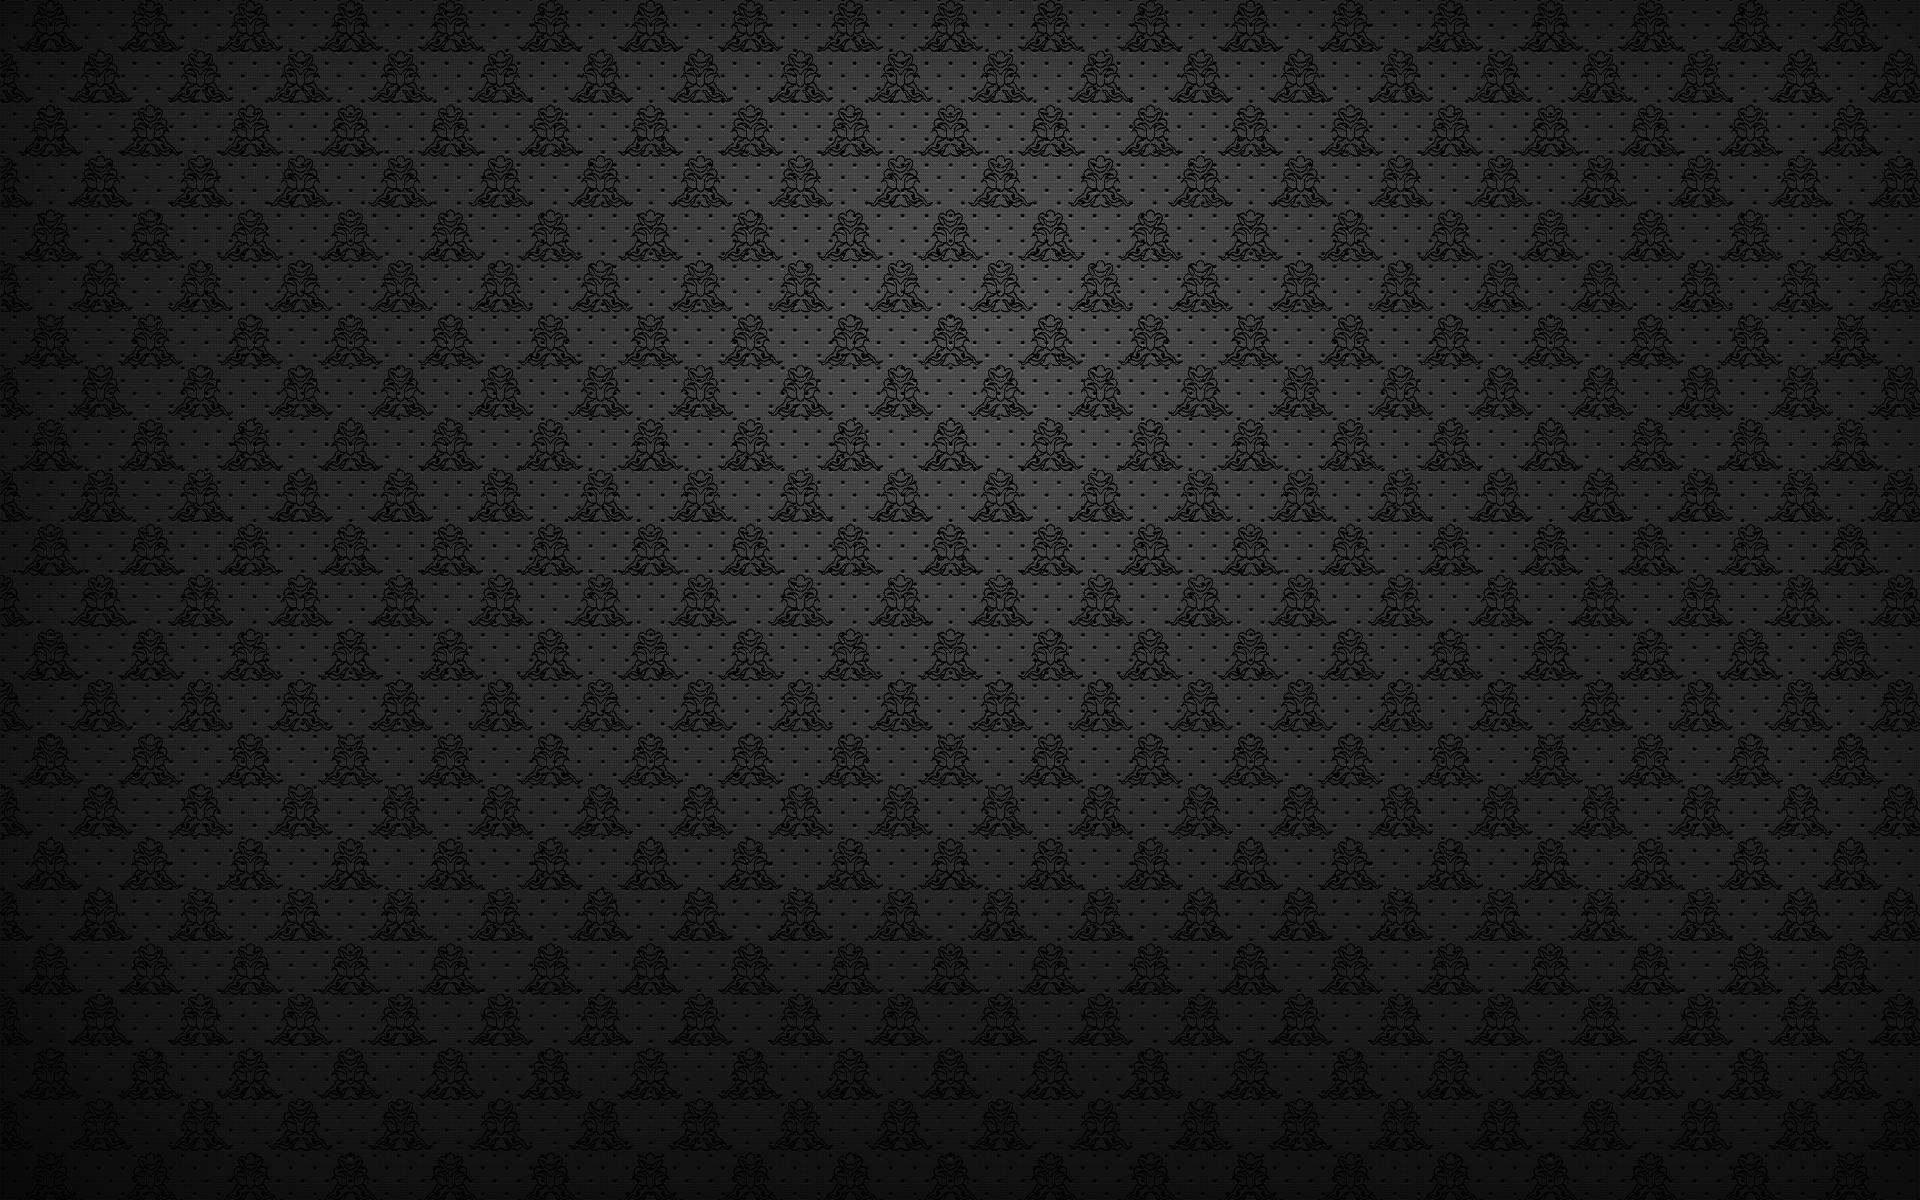 Dark Textures clipart golden texture Templates background patterns download pattern